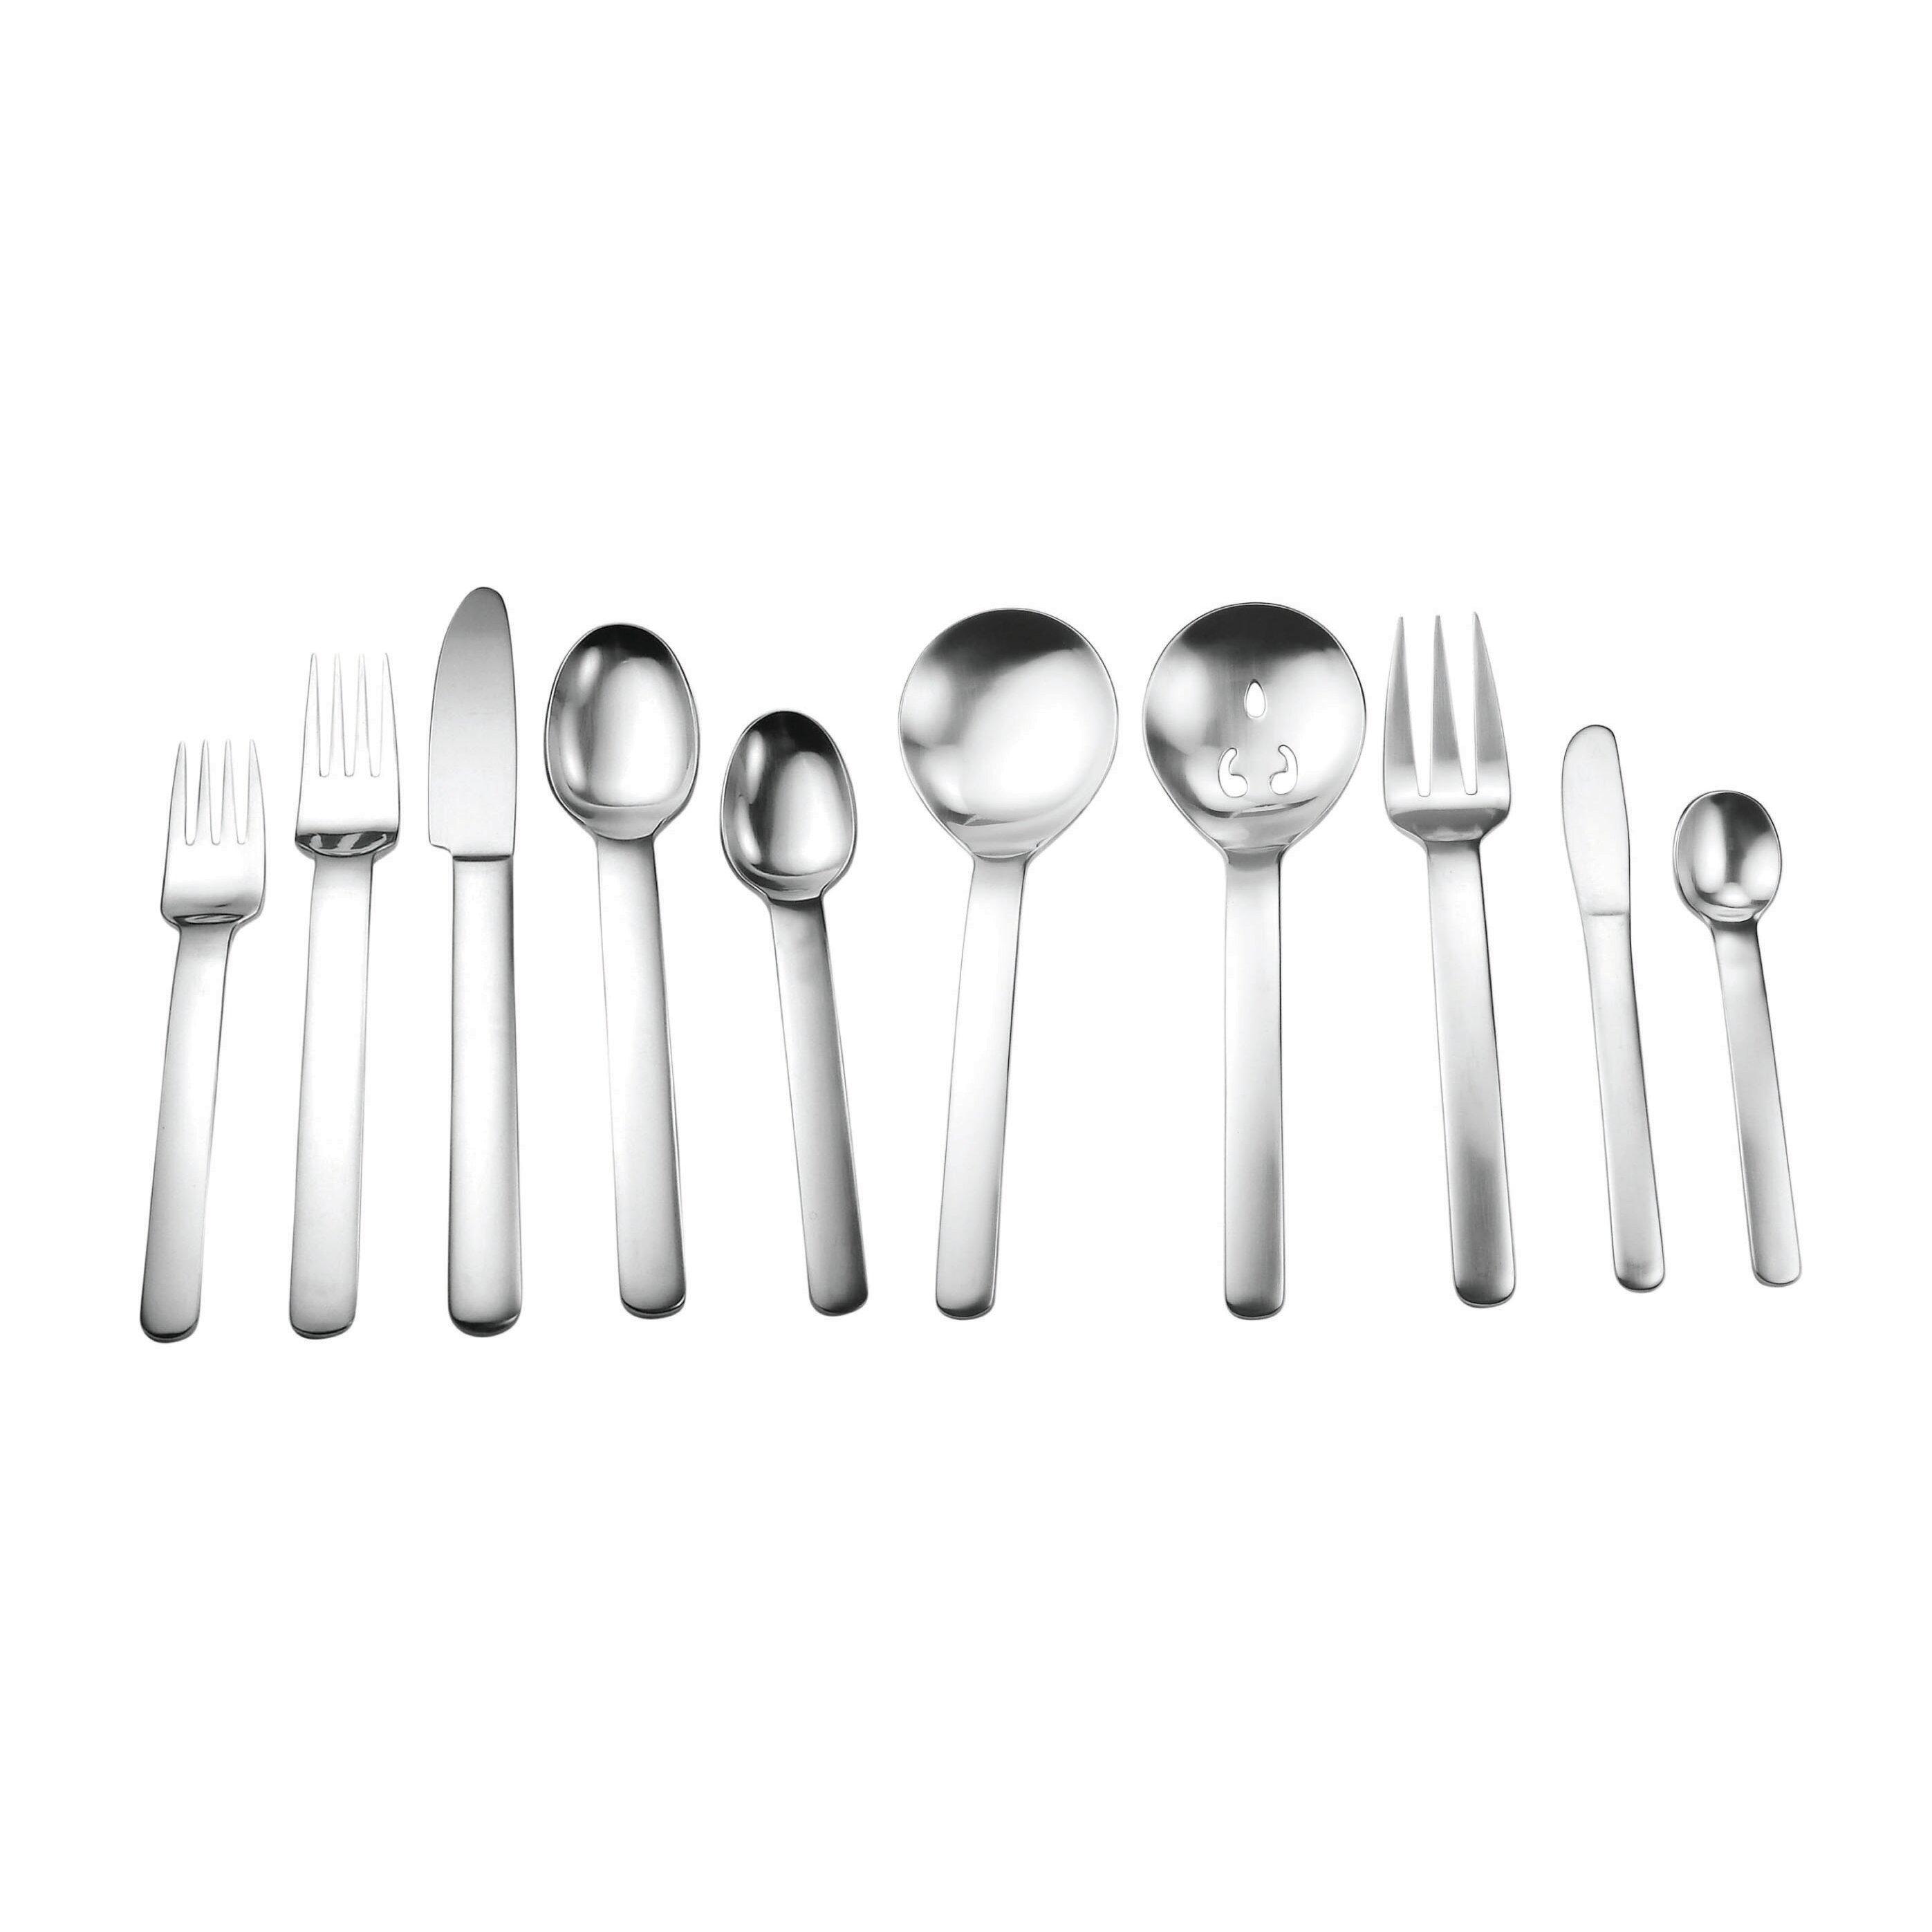 David shaw silverware splendide blizzard 45 piece flatware set reviews wayfair - Splendide flatware ...